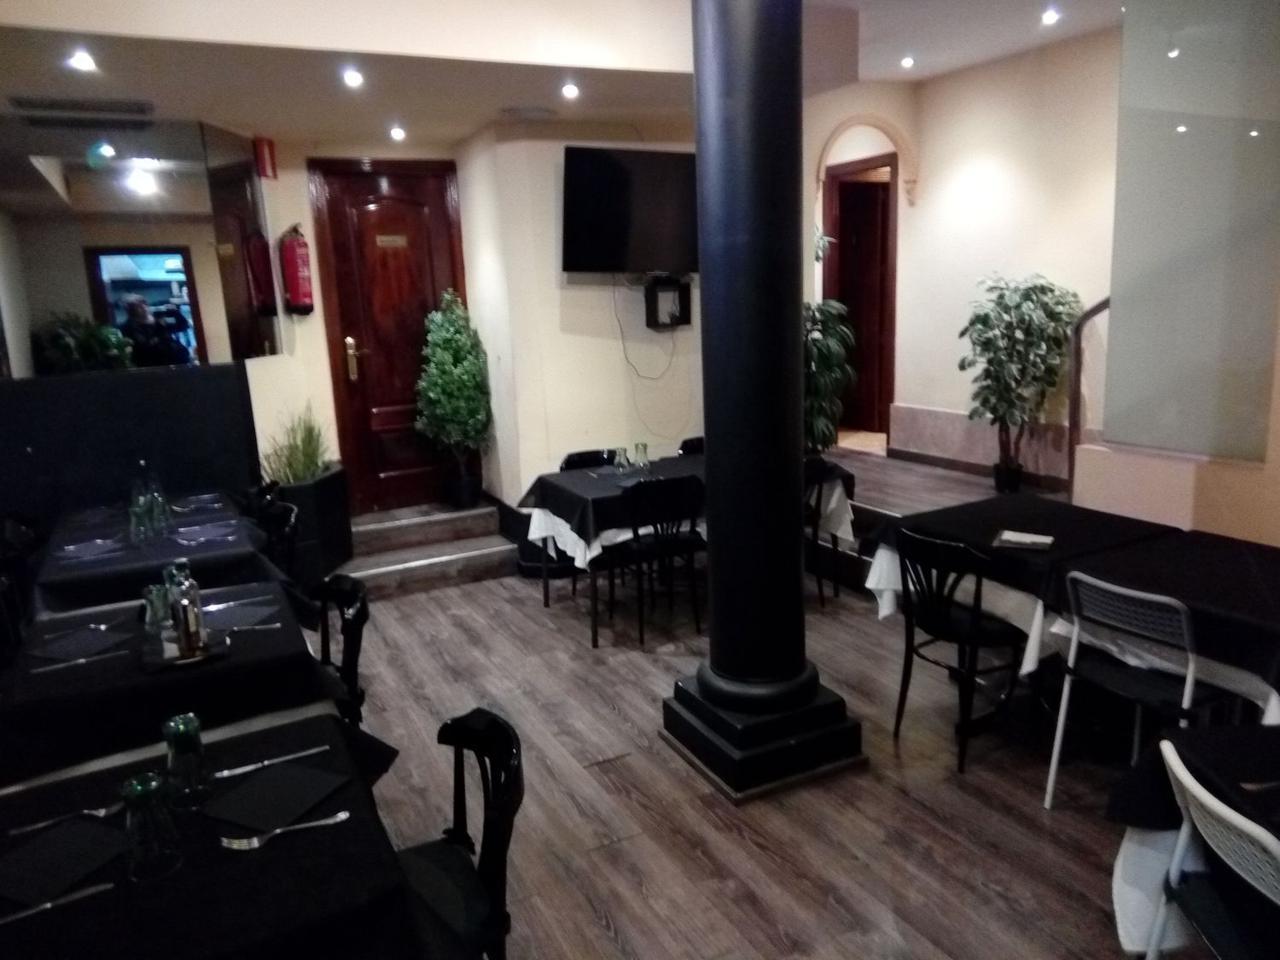 Alquiler Local Comercial  Trafalgar. Bar restaurante, calle principal, alto trafico peatonal , local